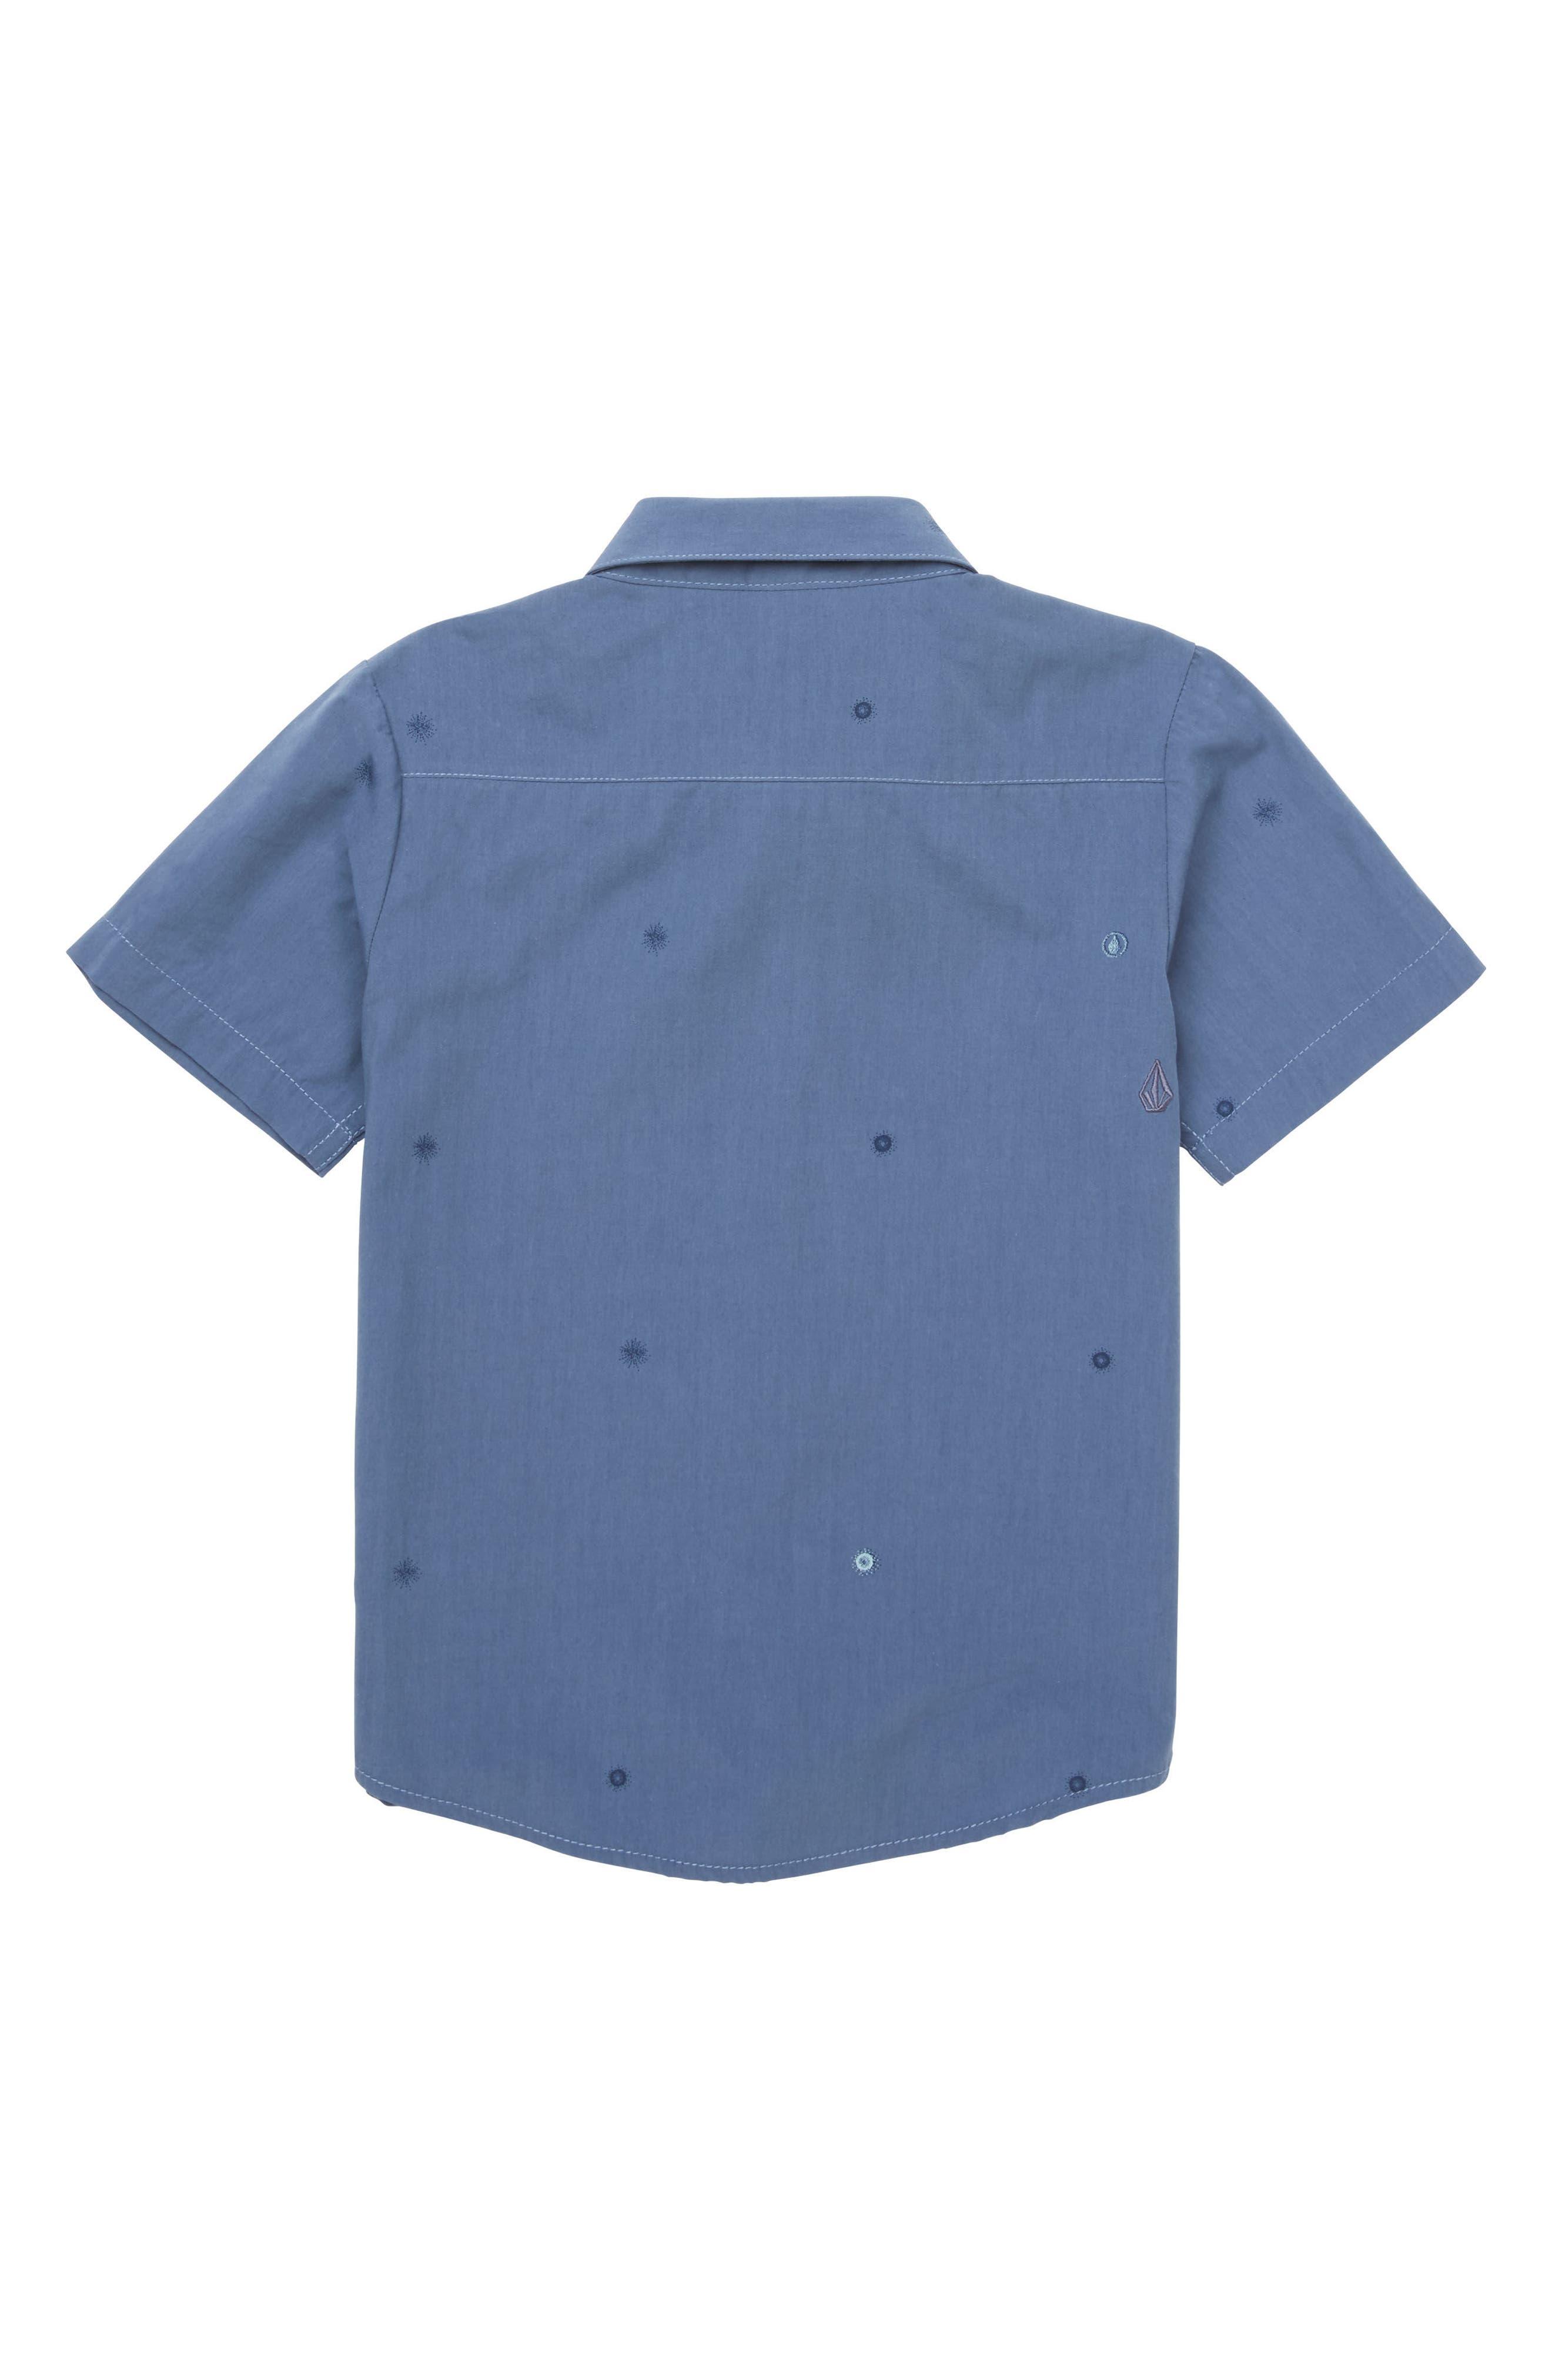 Bleeker Woven Shirt,                             Alternate thumbnail 2, color,                             463